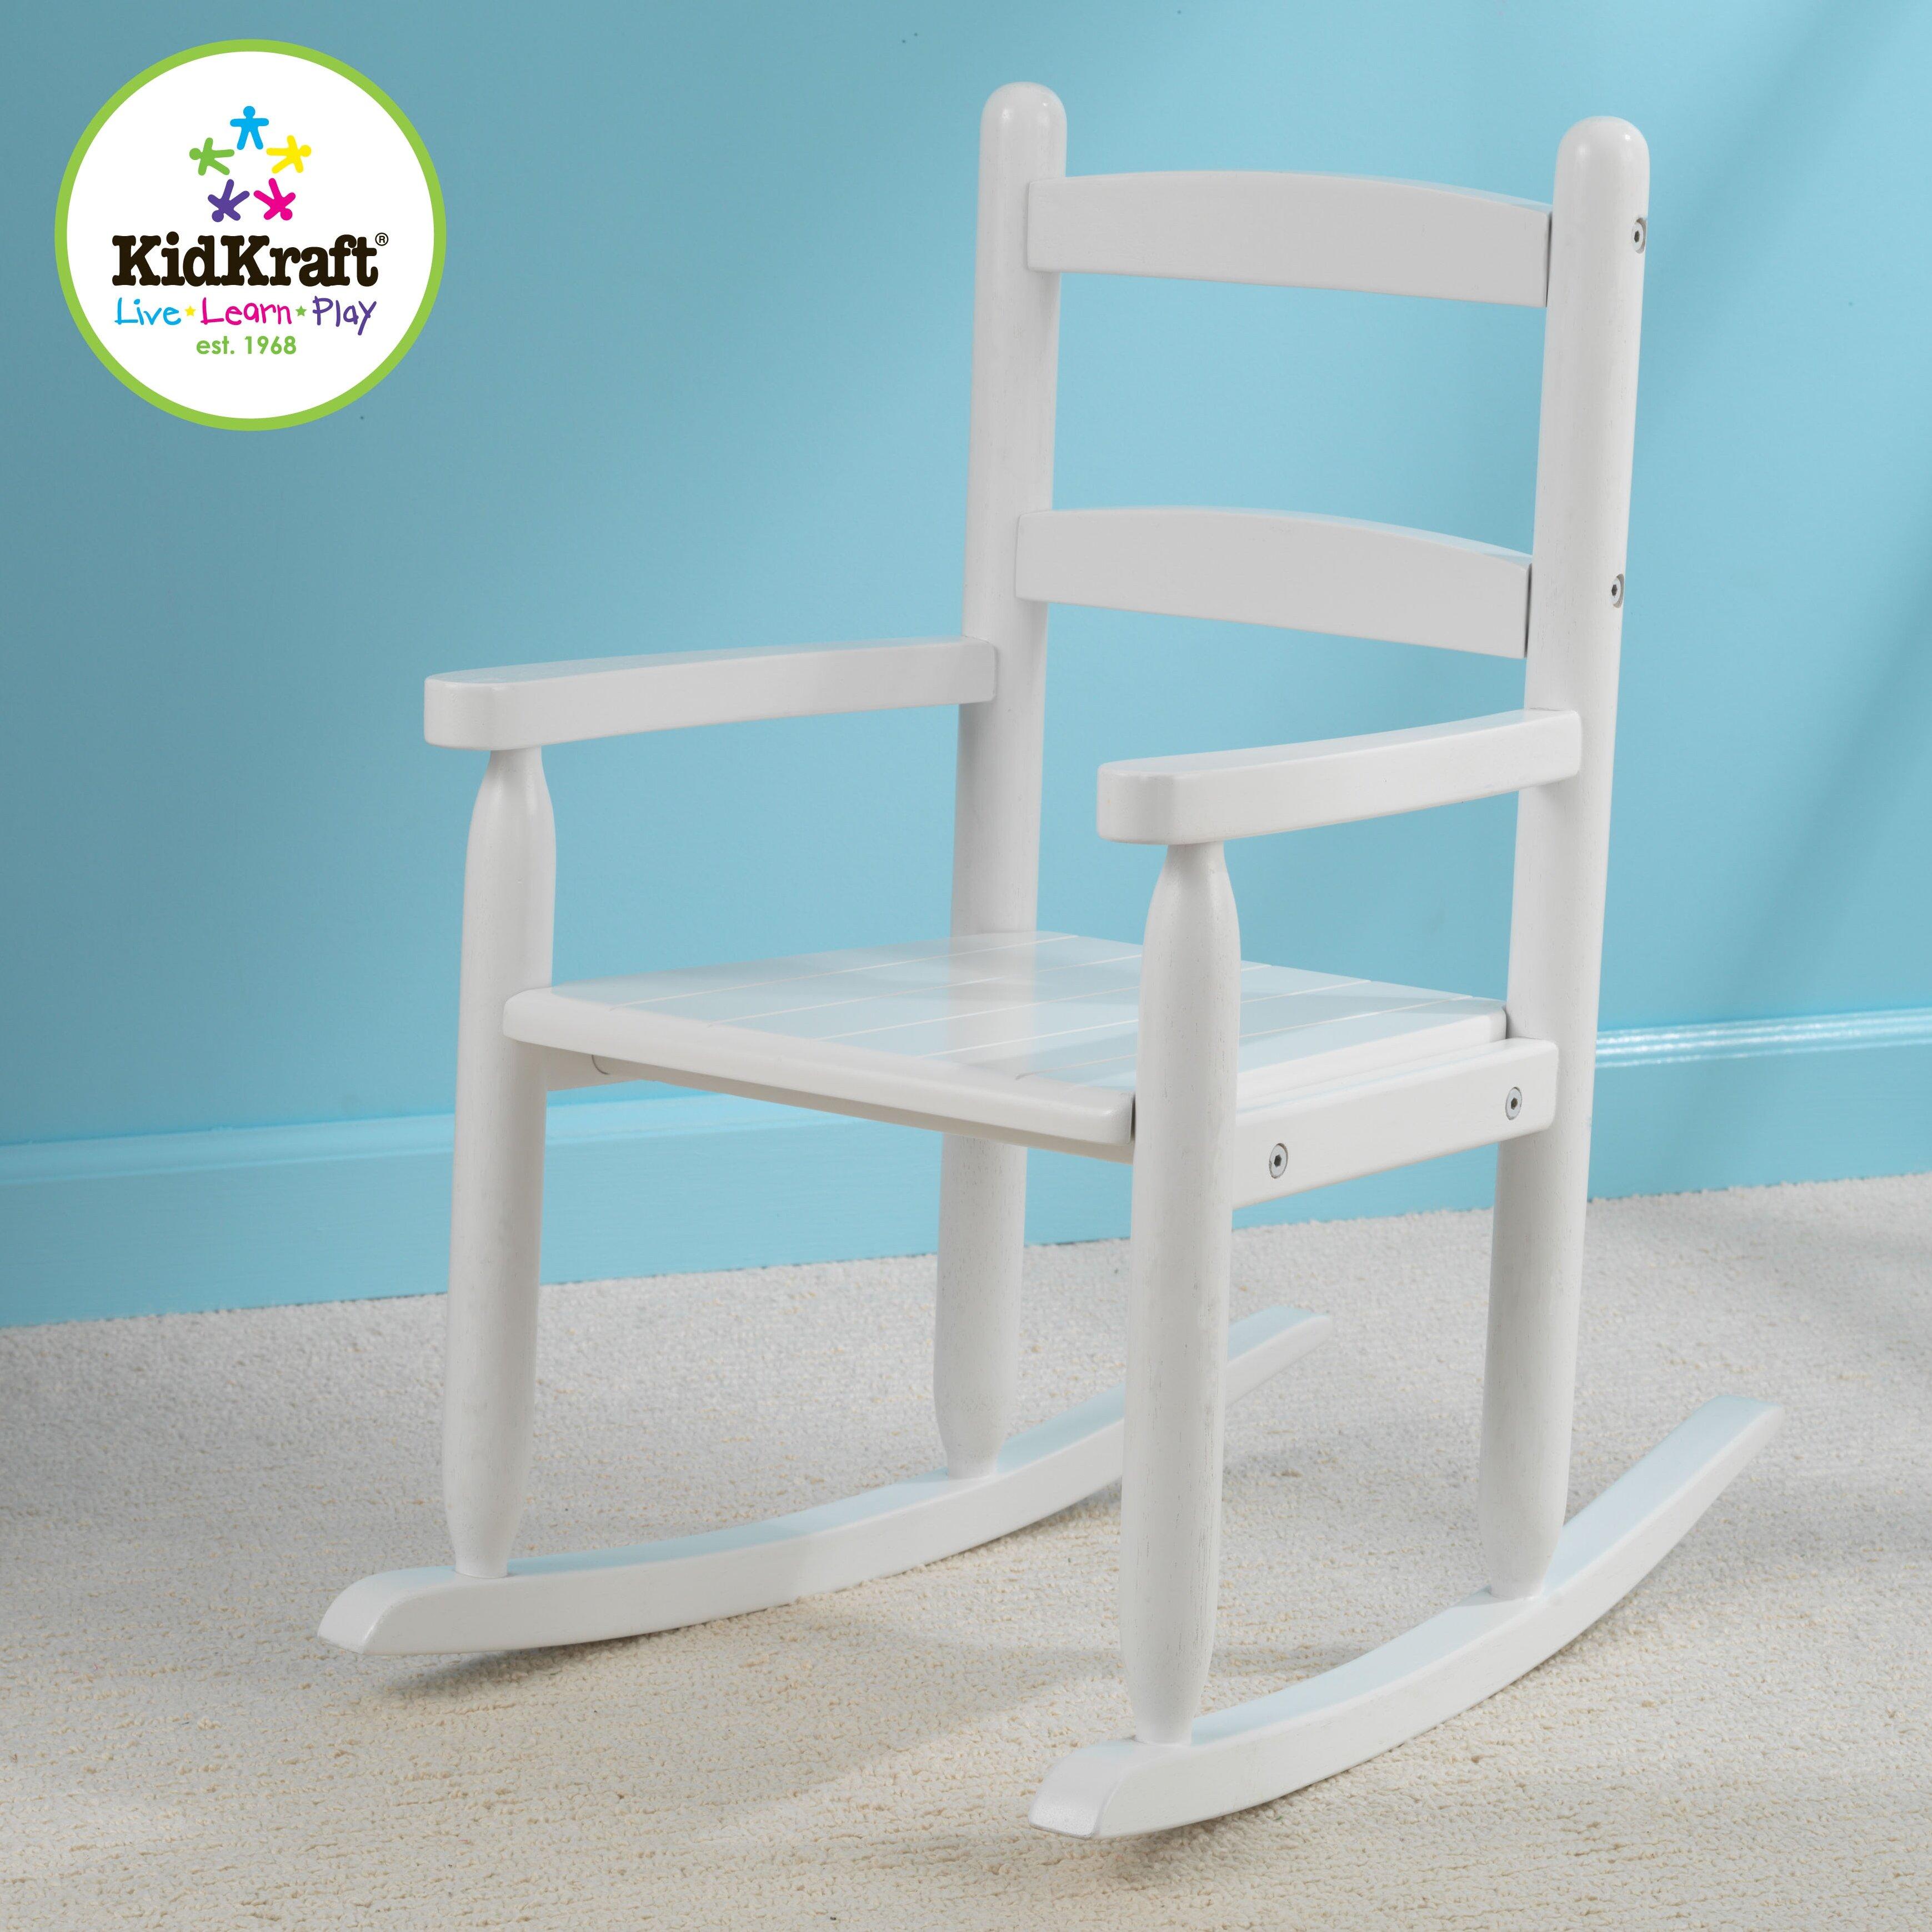 Baby & Kids Playroom ... All Kids Seating KidKraft SKU: KK1653